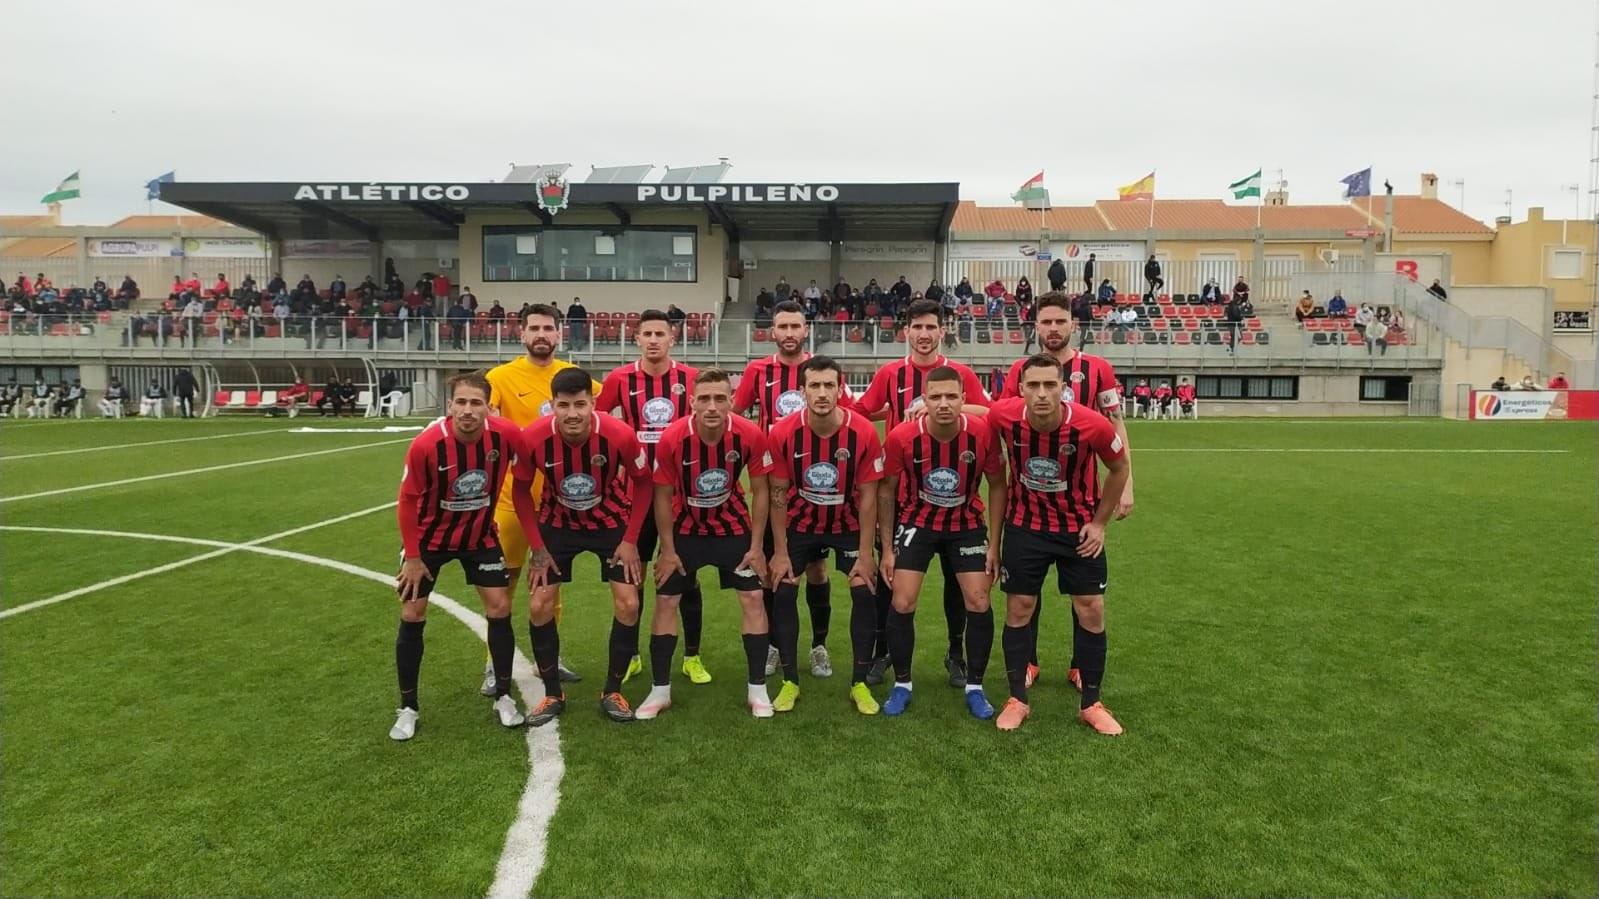 Atlético Pulpileño vs FC Cartagena SAD 1